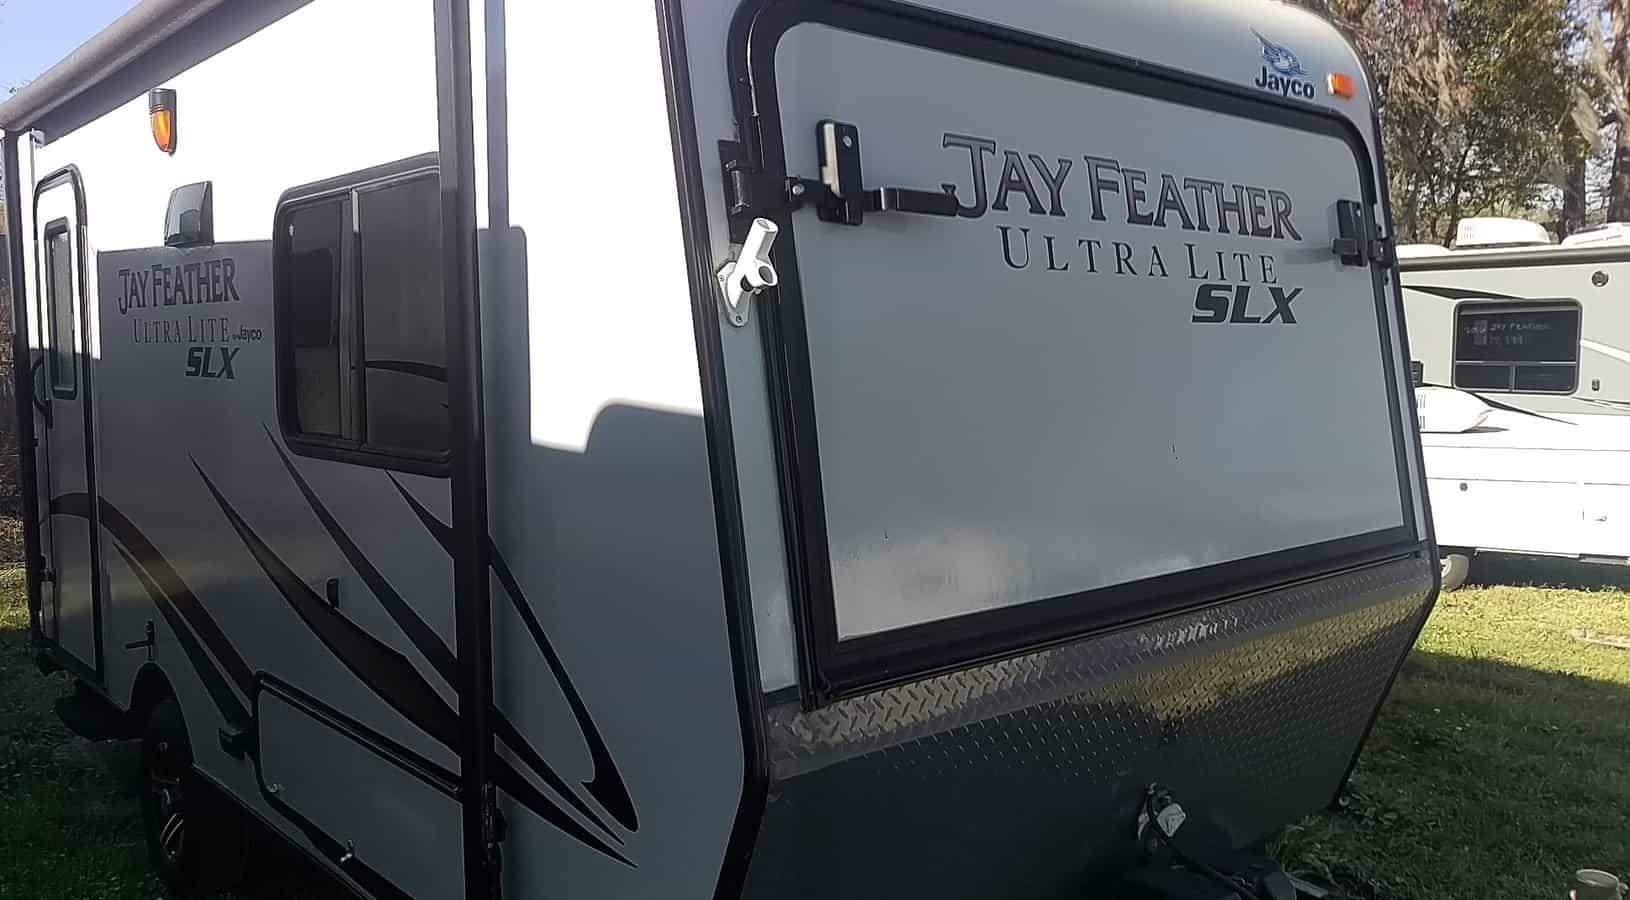 USED 2014 Jayco Jay Feather Ultra Lite 16XRB